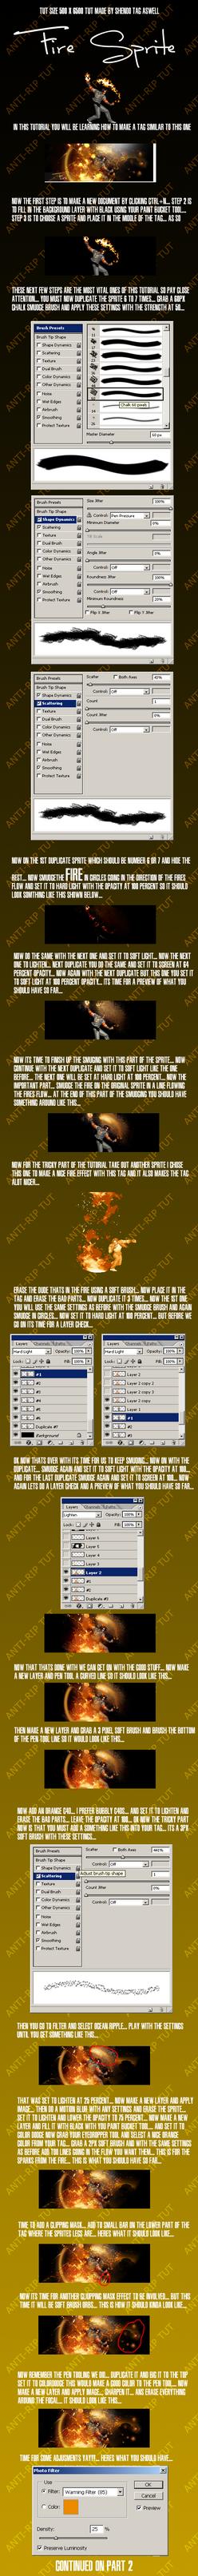 Fire Sprite Tutorial by Sh3ndo